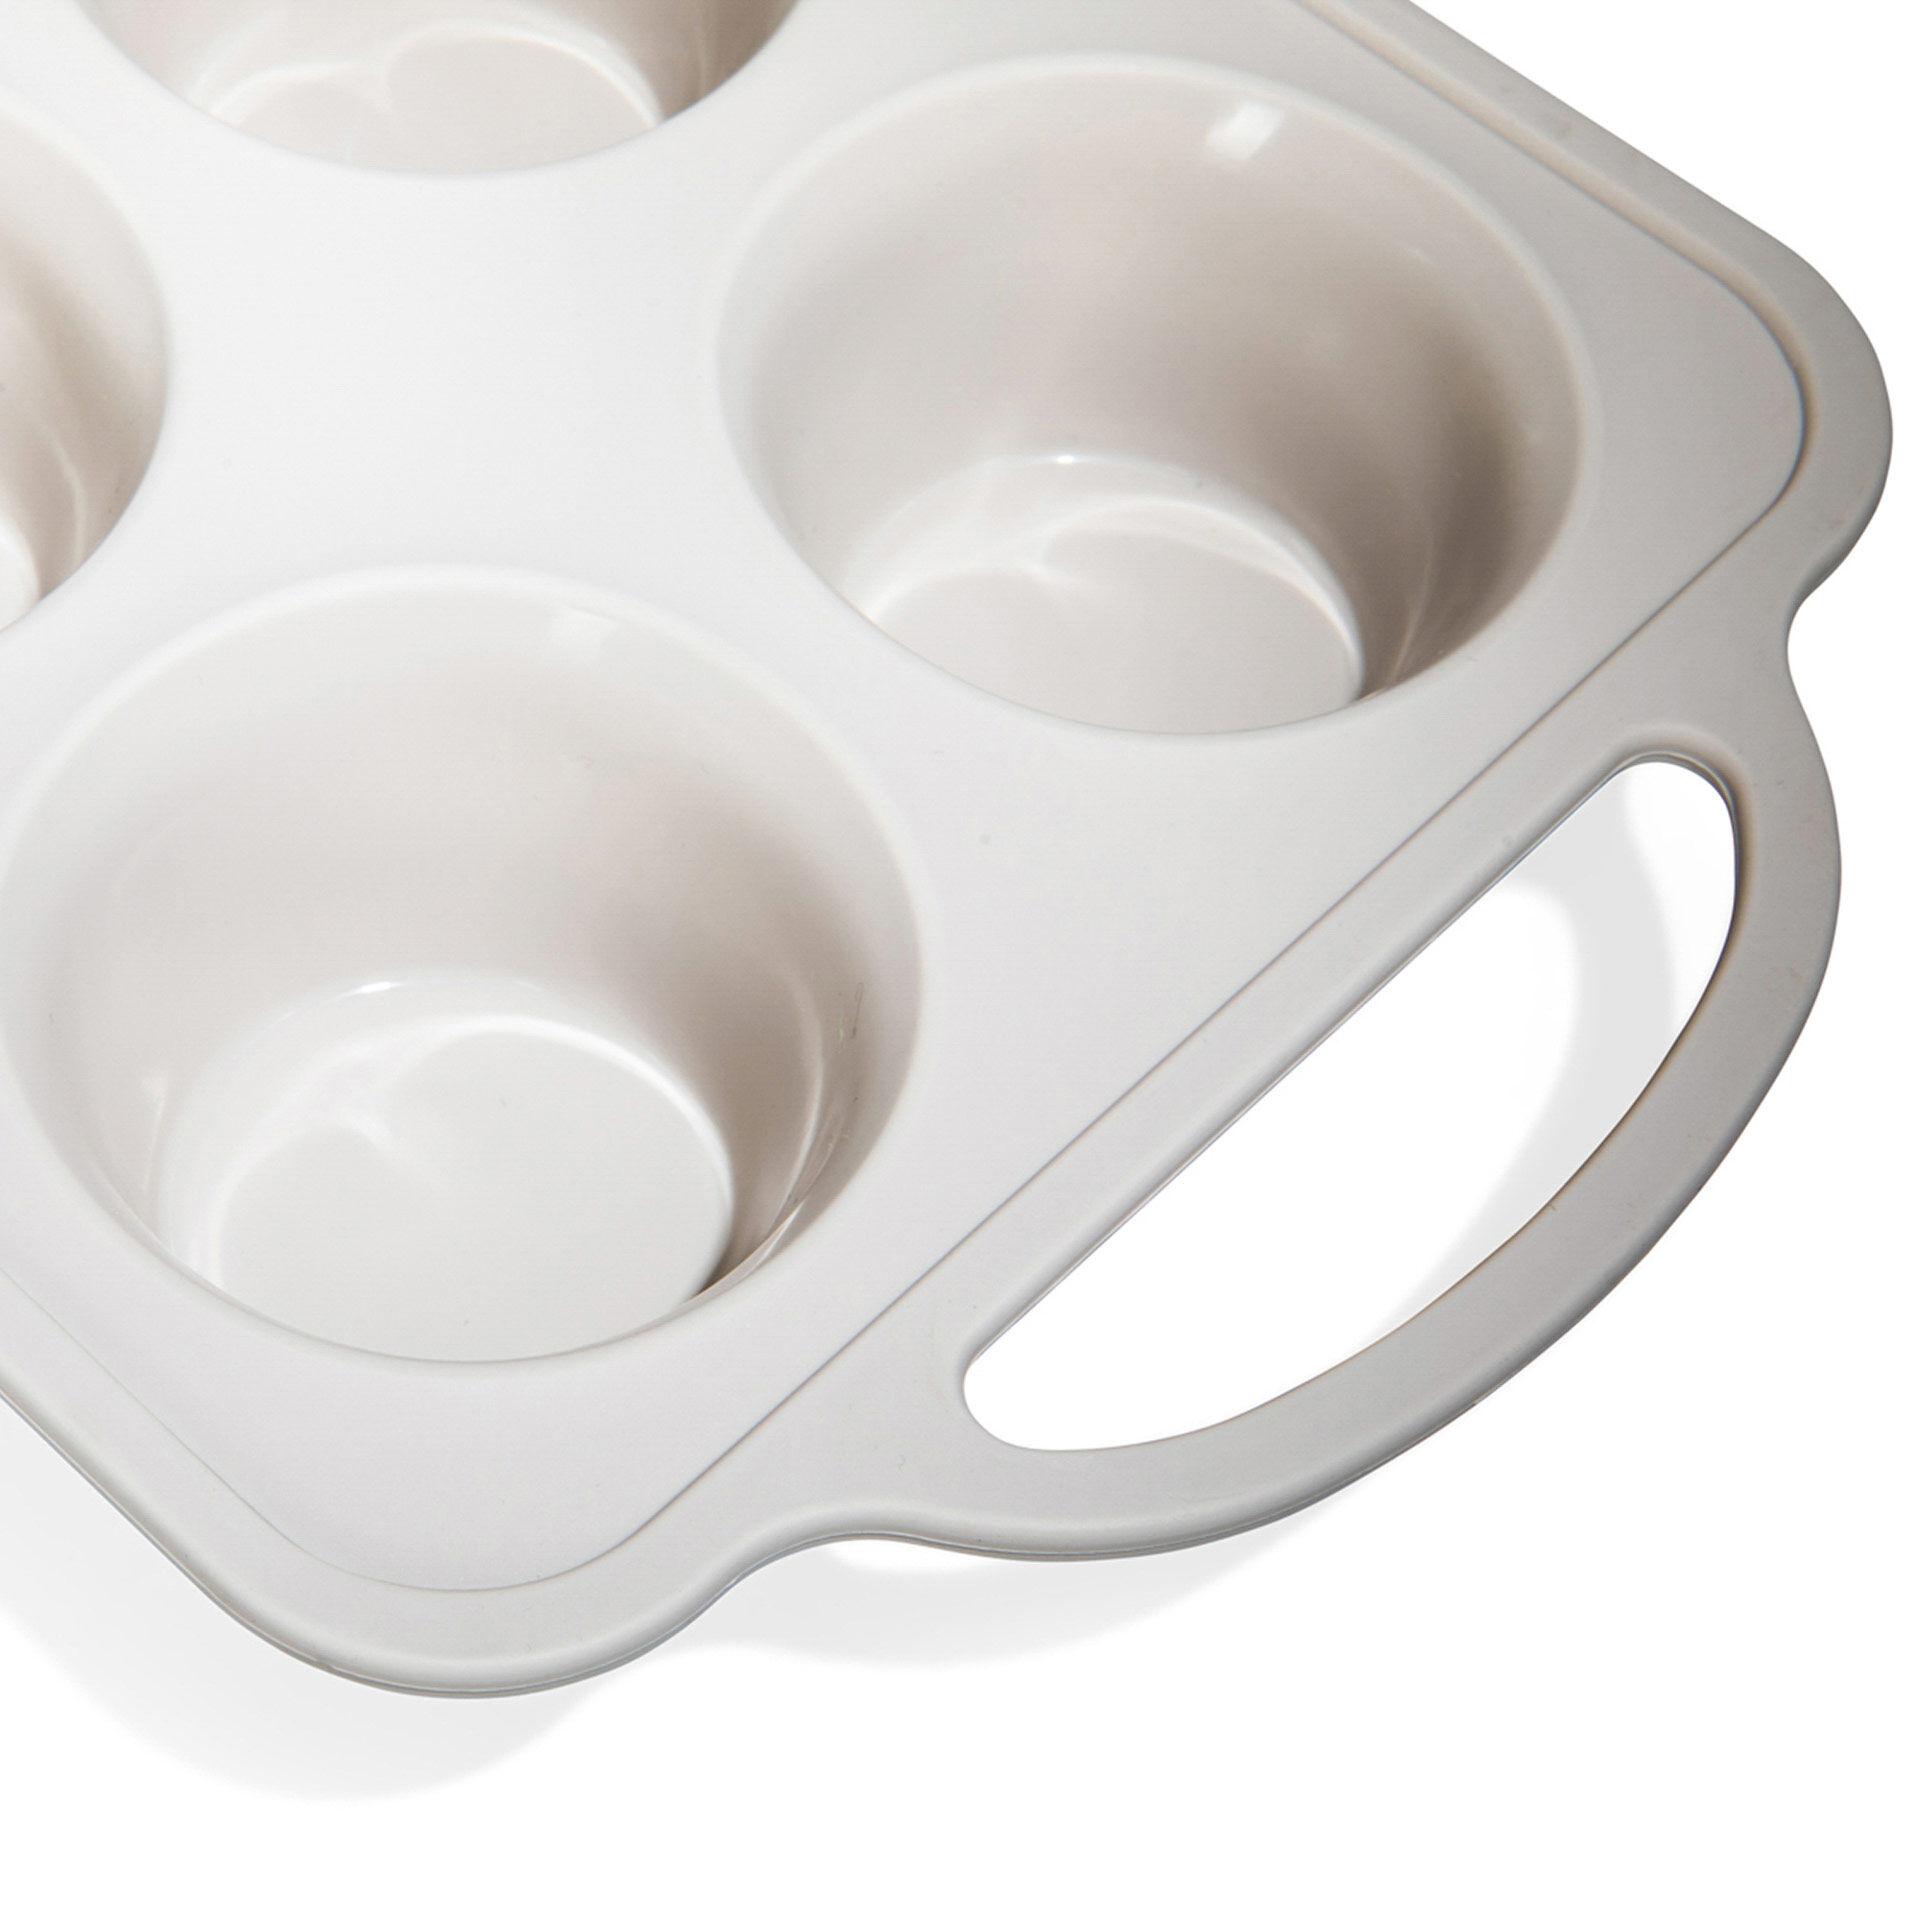 Moule à muffins / cupcakes en silicone, , large